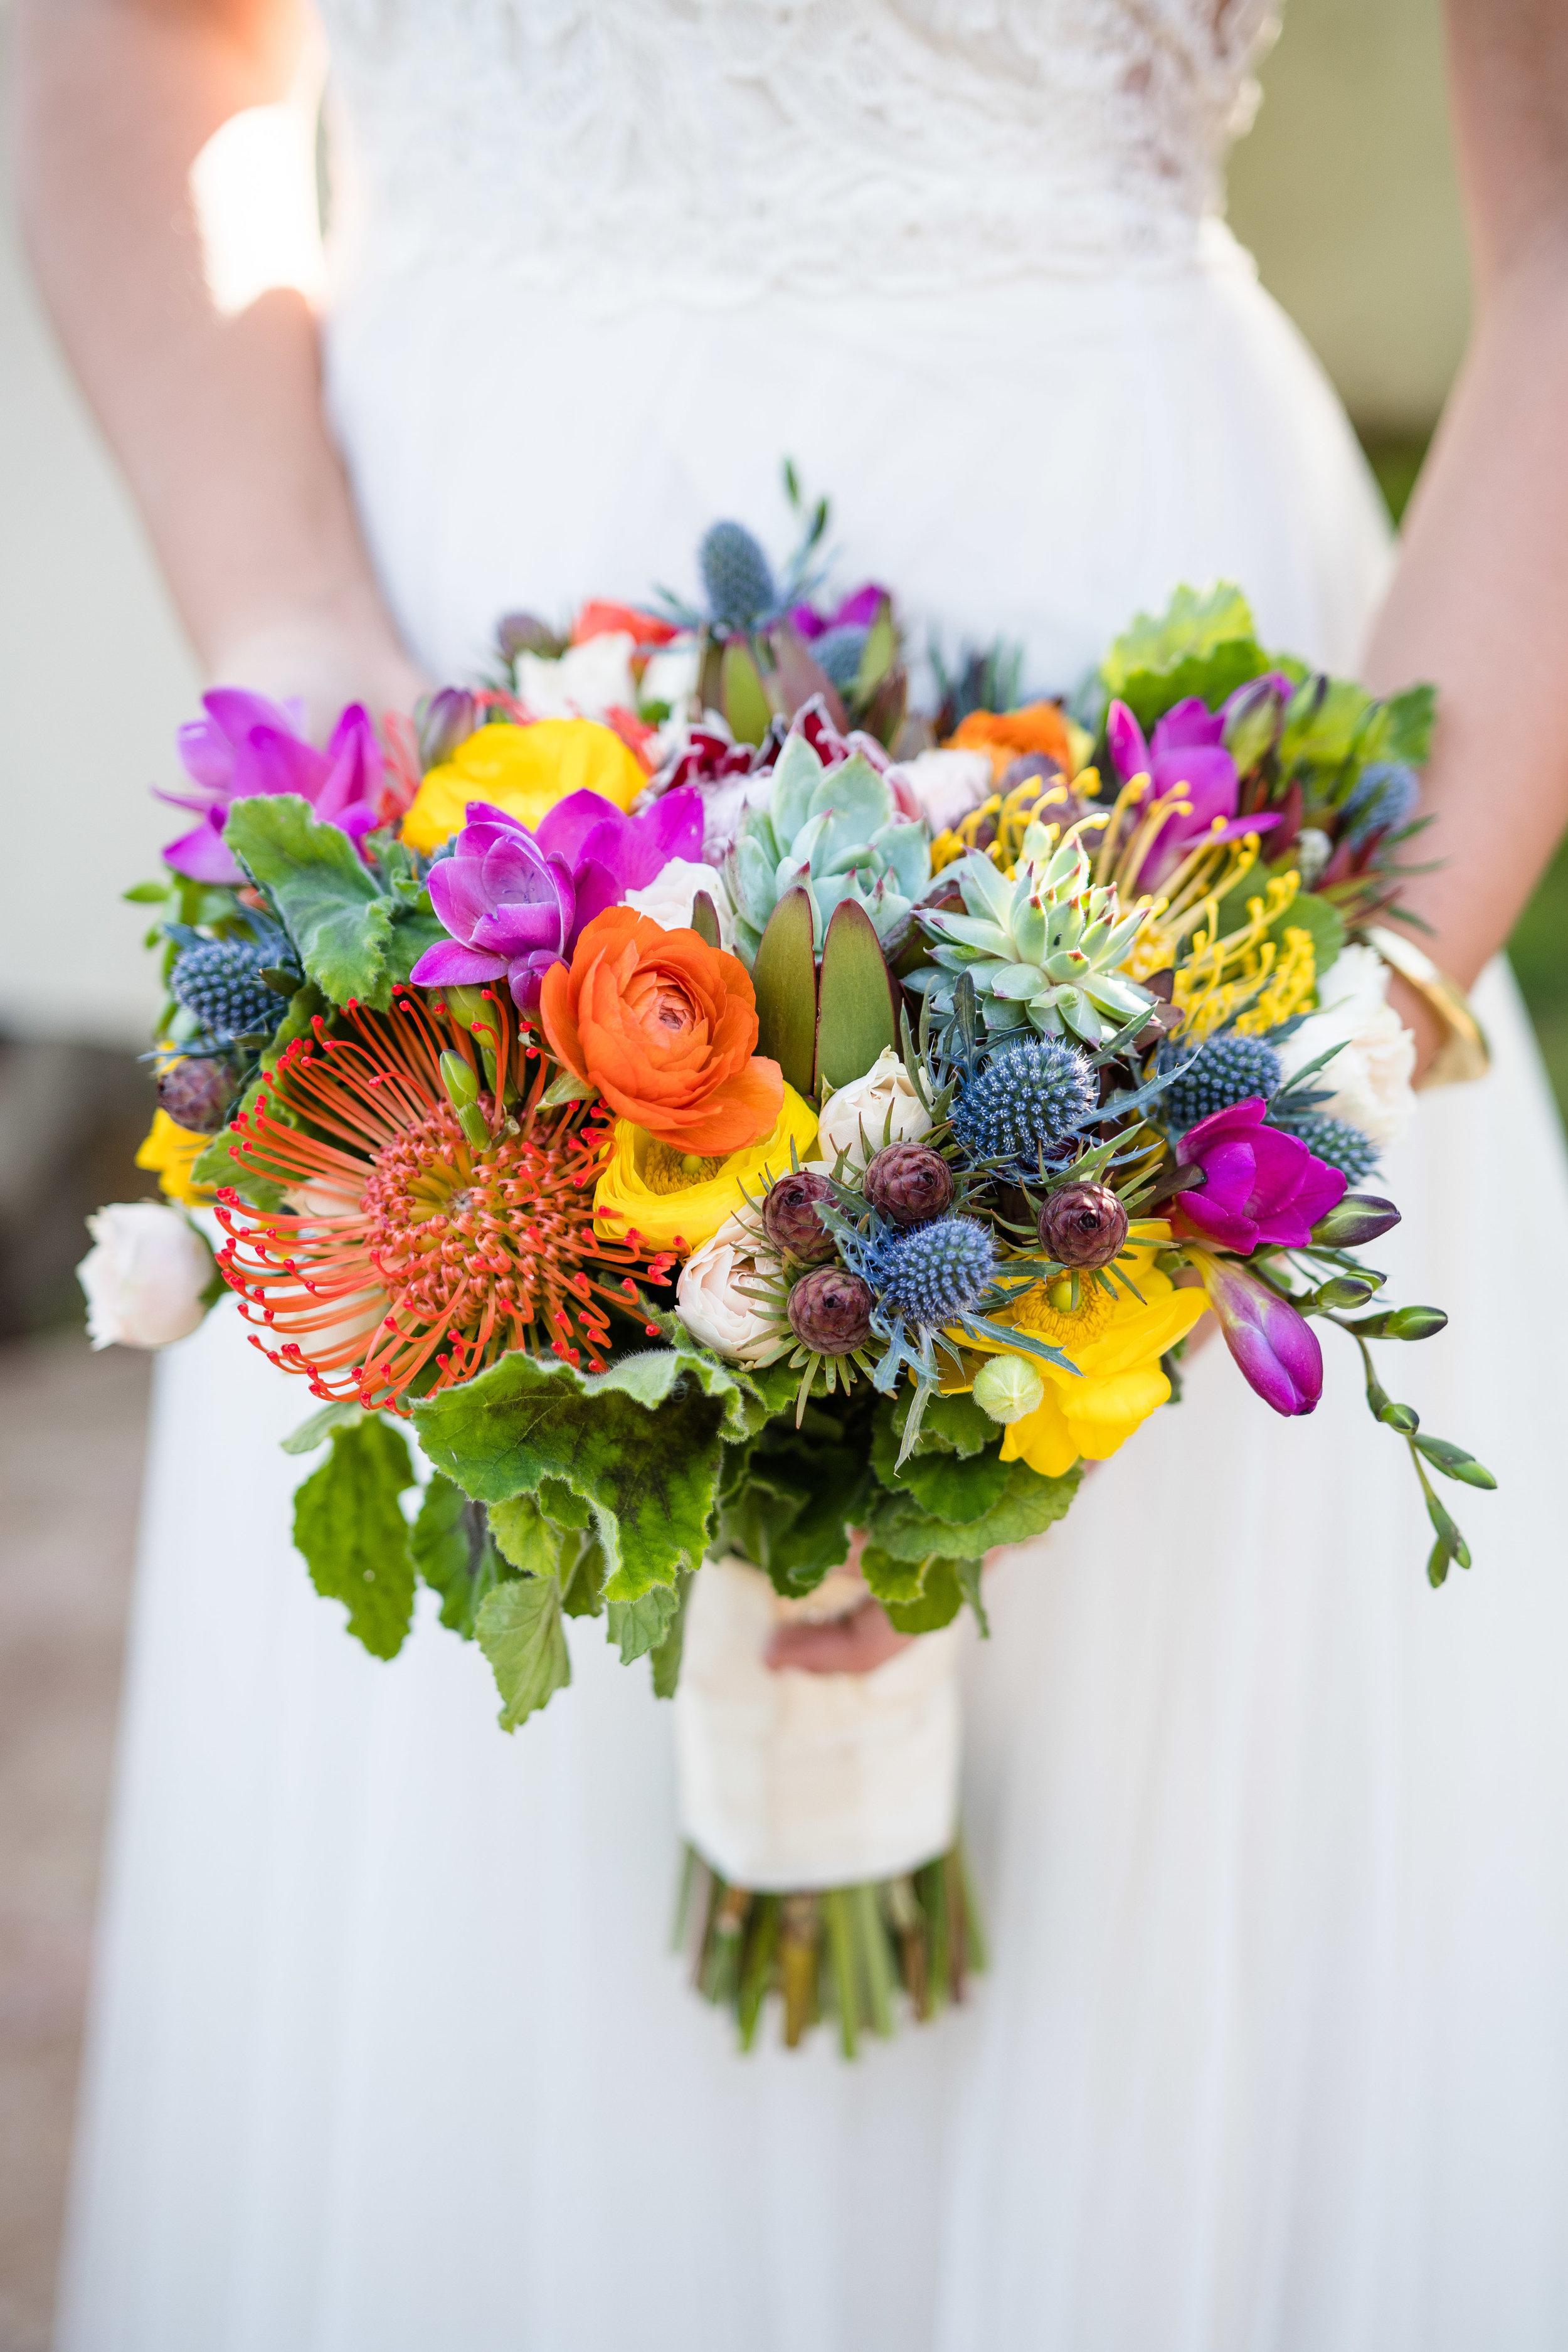 Vibrant Fiesta Backyard Wedding Reception gorgeous spring blooms in bridal bouquet.jpg